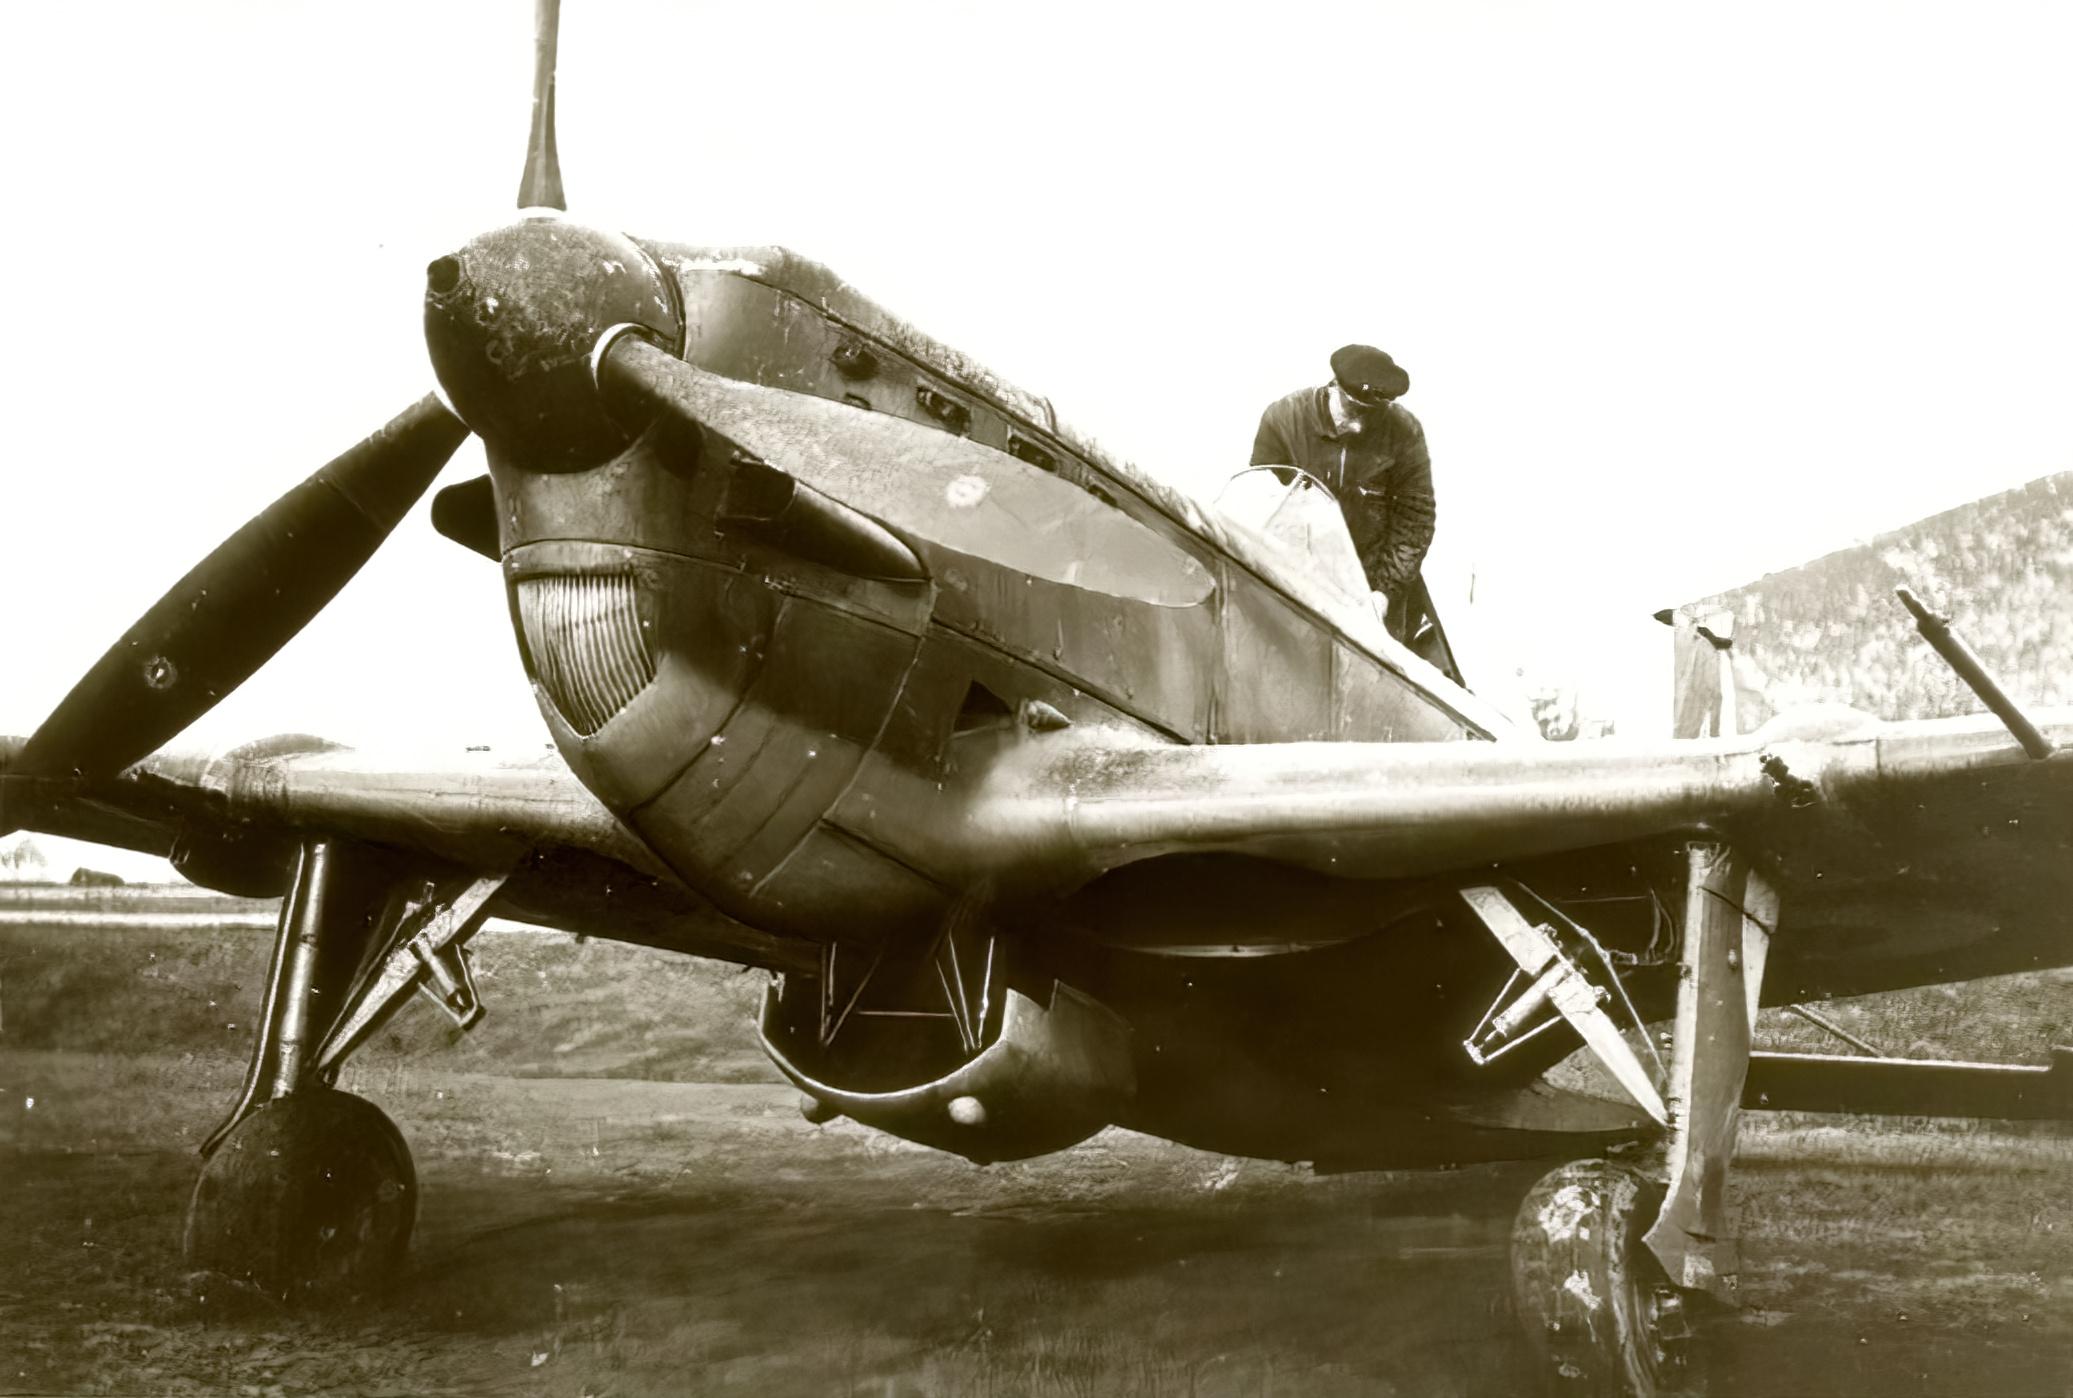 French Airforce Morane Saulnier MS 406C1 France 1940 ebay 01